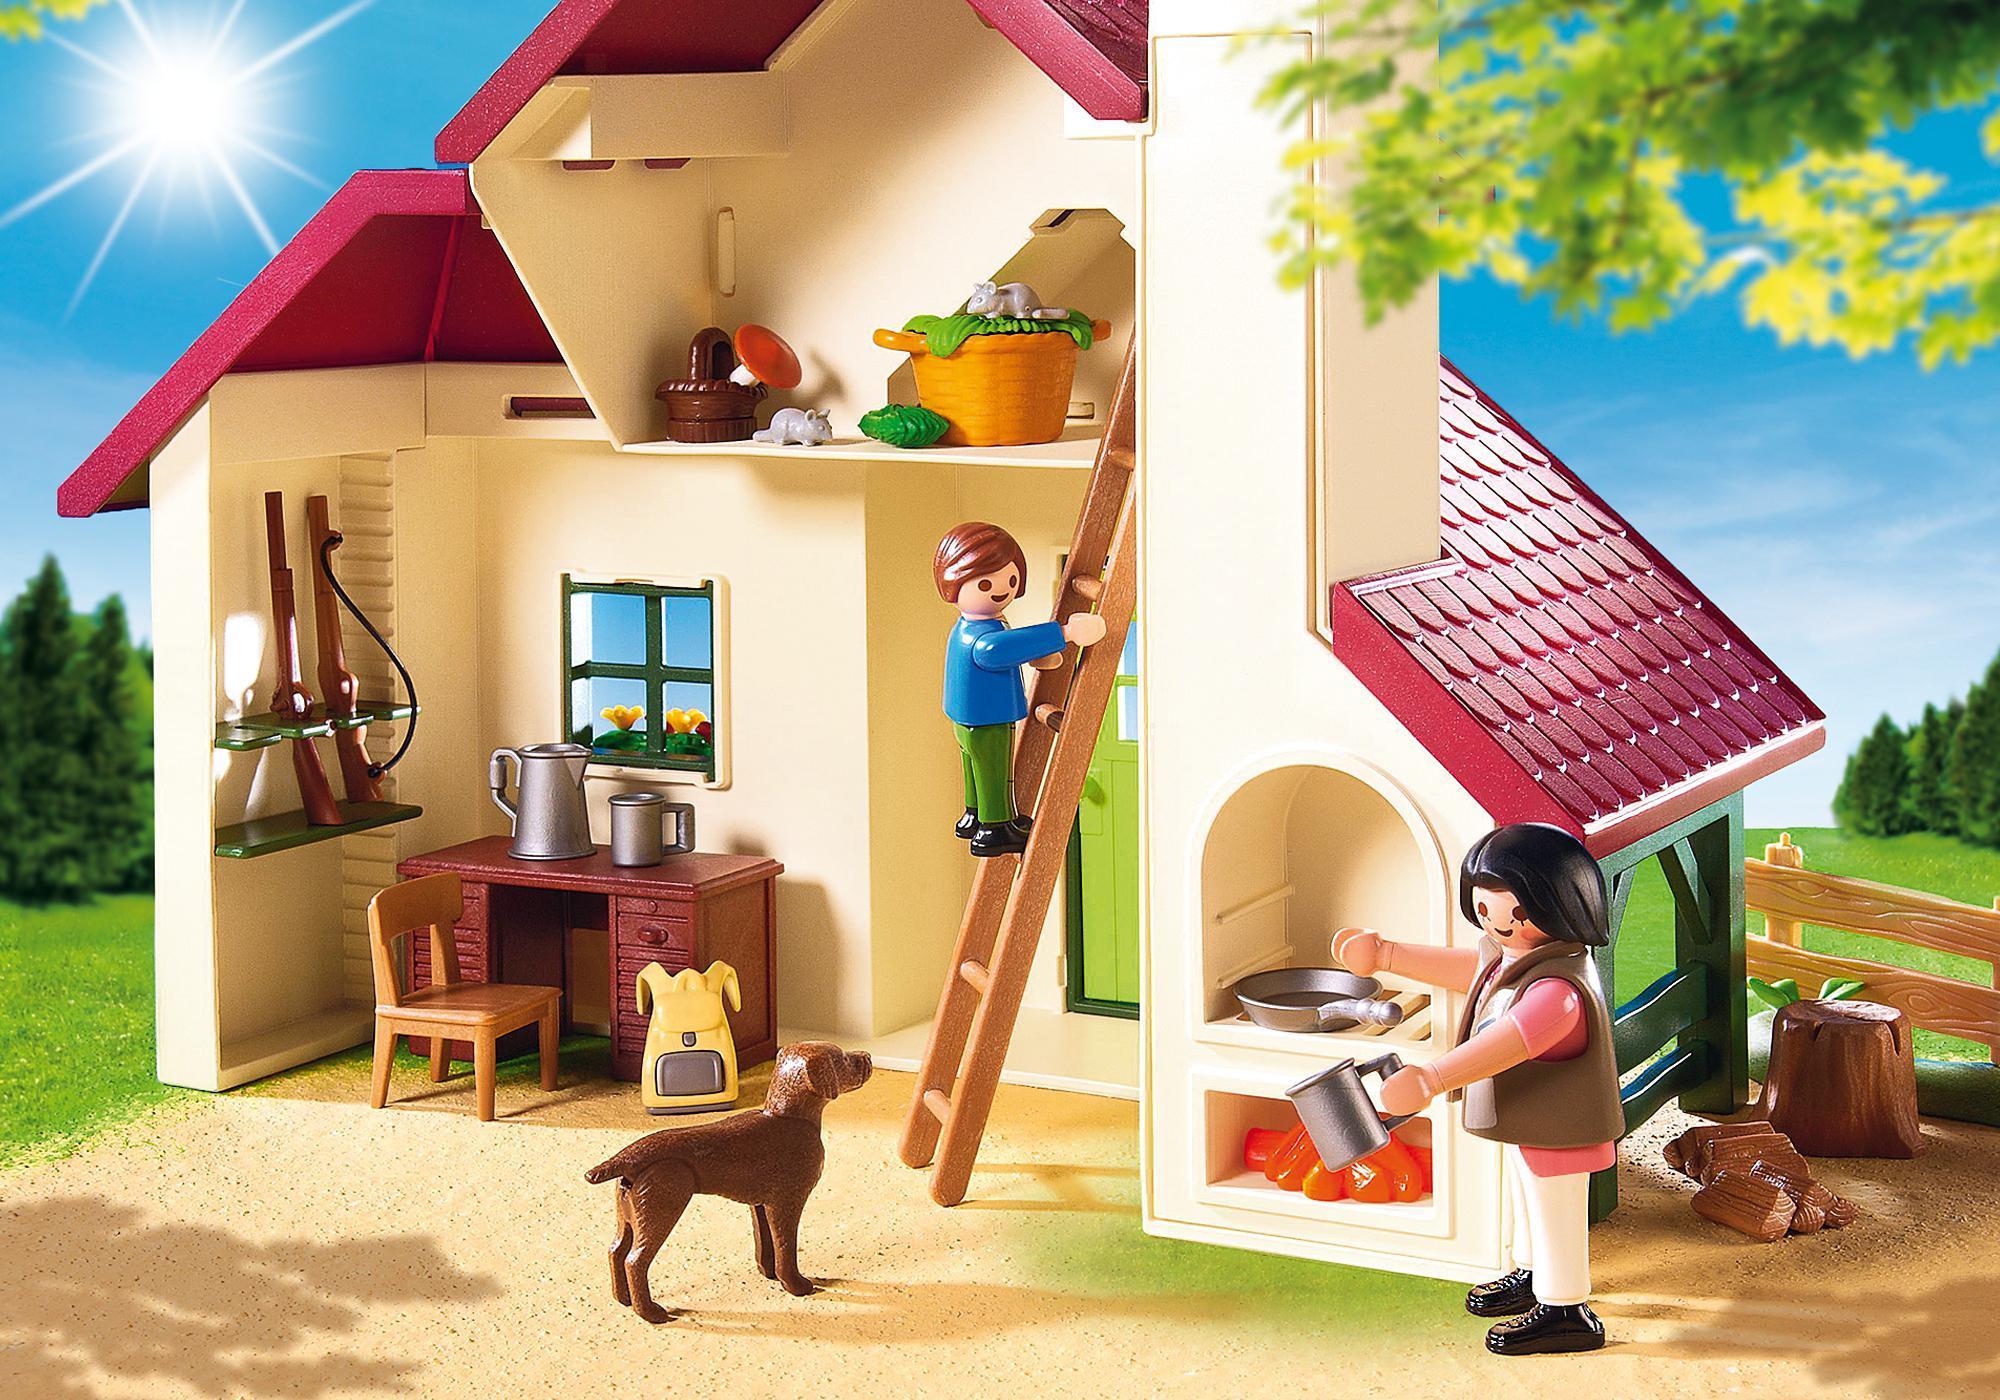 http://media.playmobil.com/i/playmobil/6811_product_extra1/Domek leśniczego